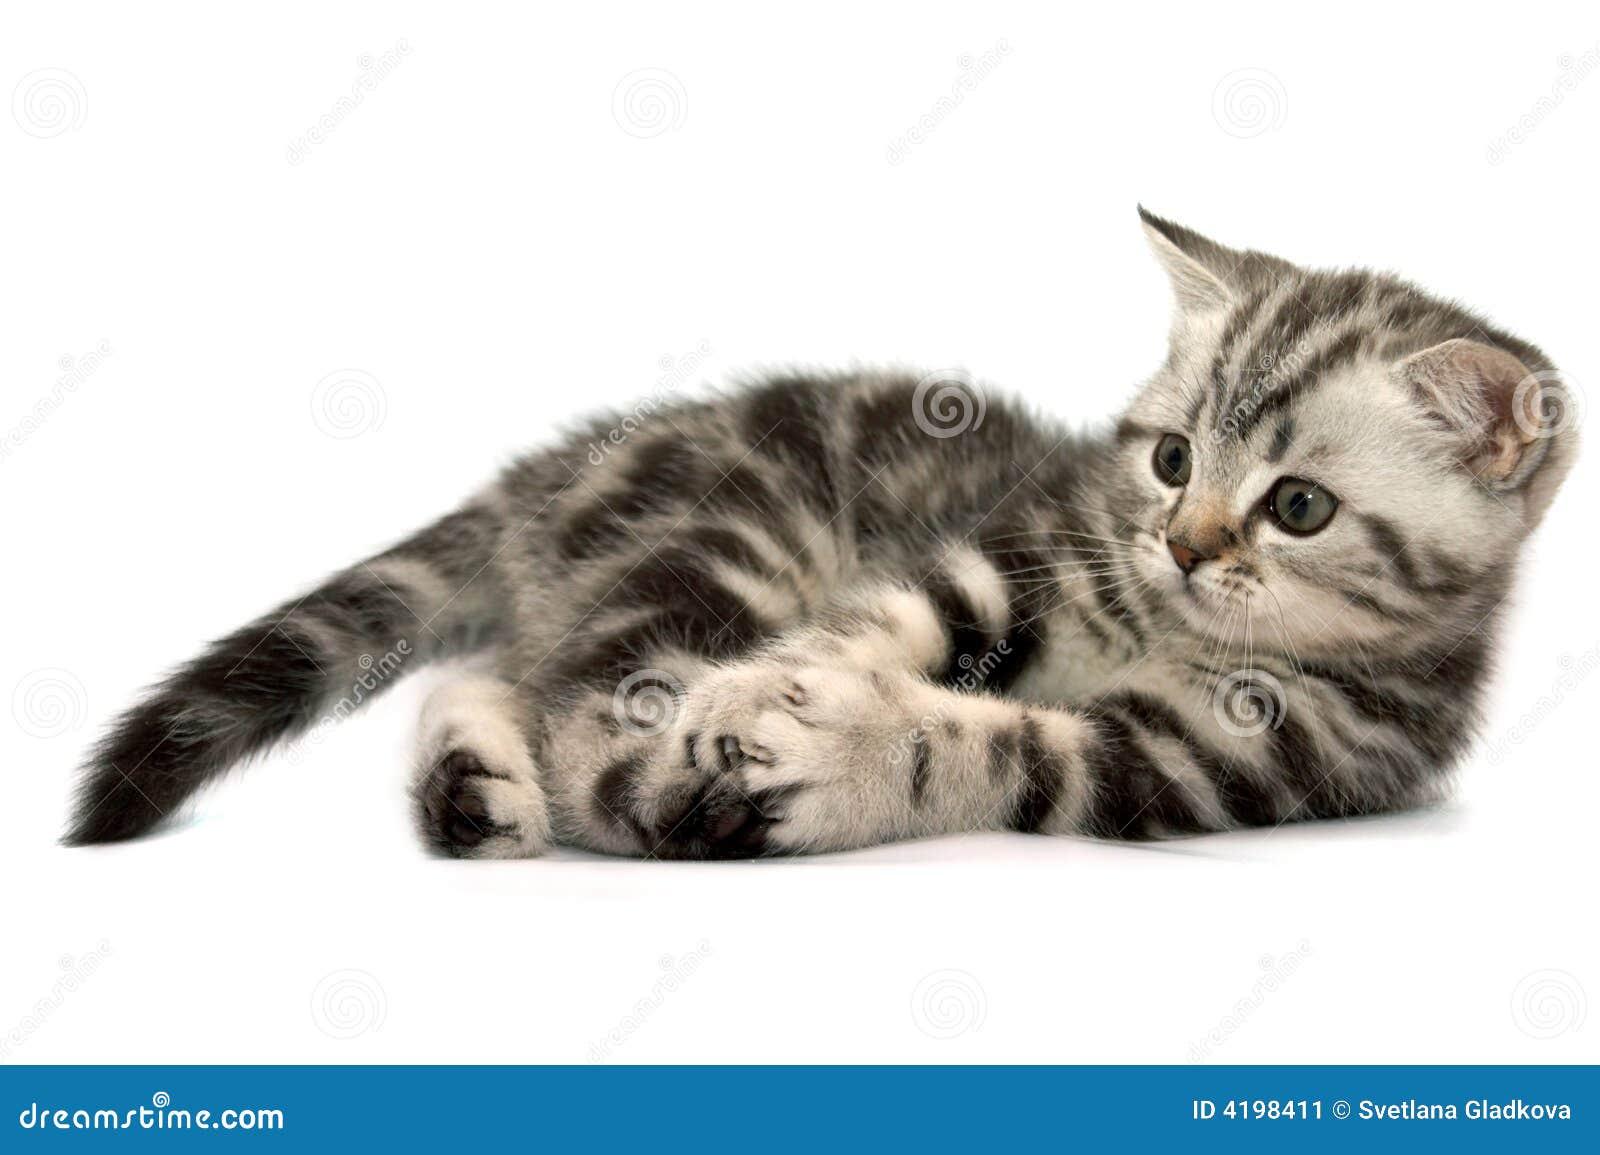 Scottish Straight Cats